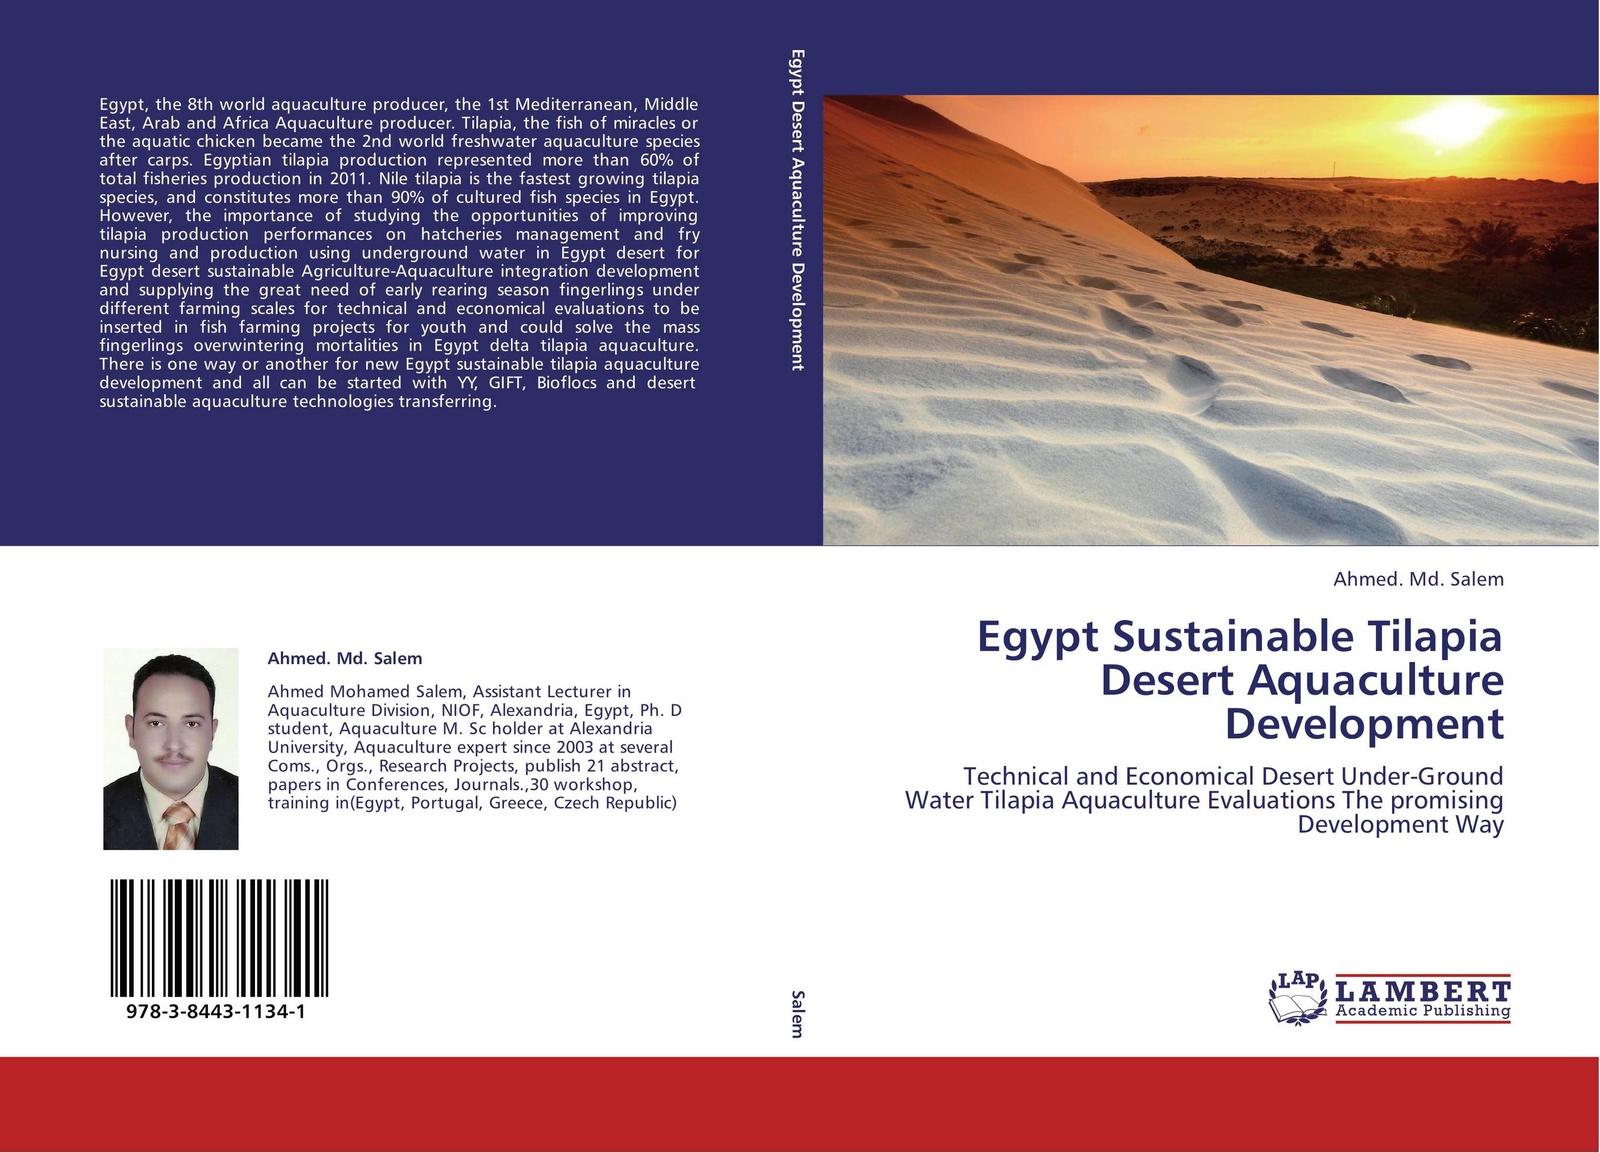 Ahmed. Md. Salem Egypt Sustainable Tilapia Desert Aquaculture Development